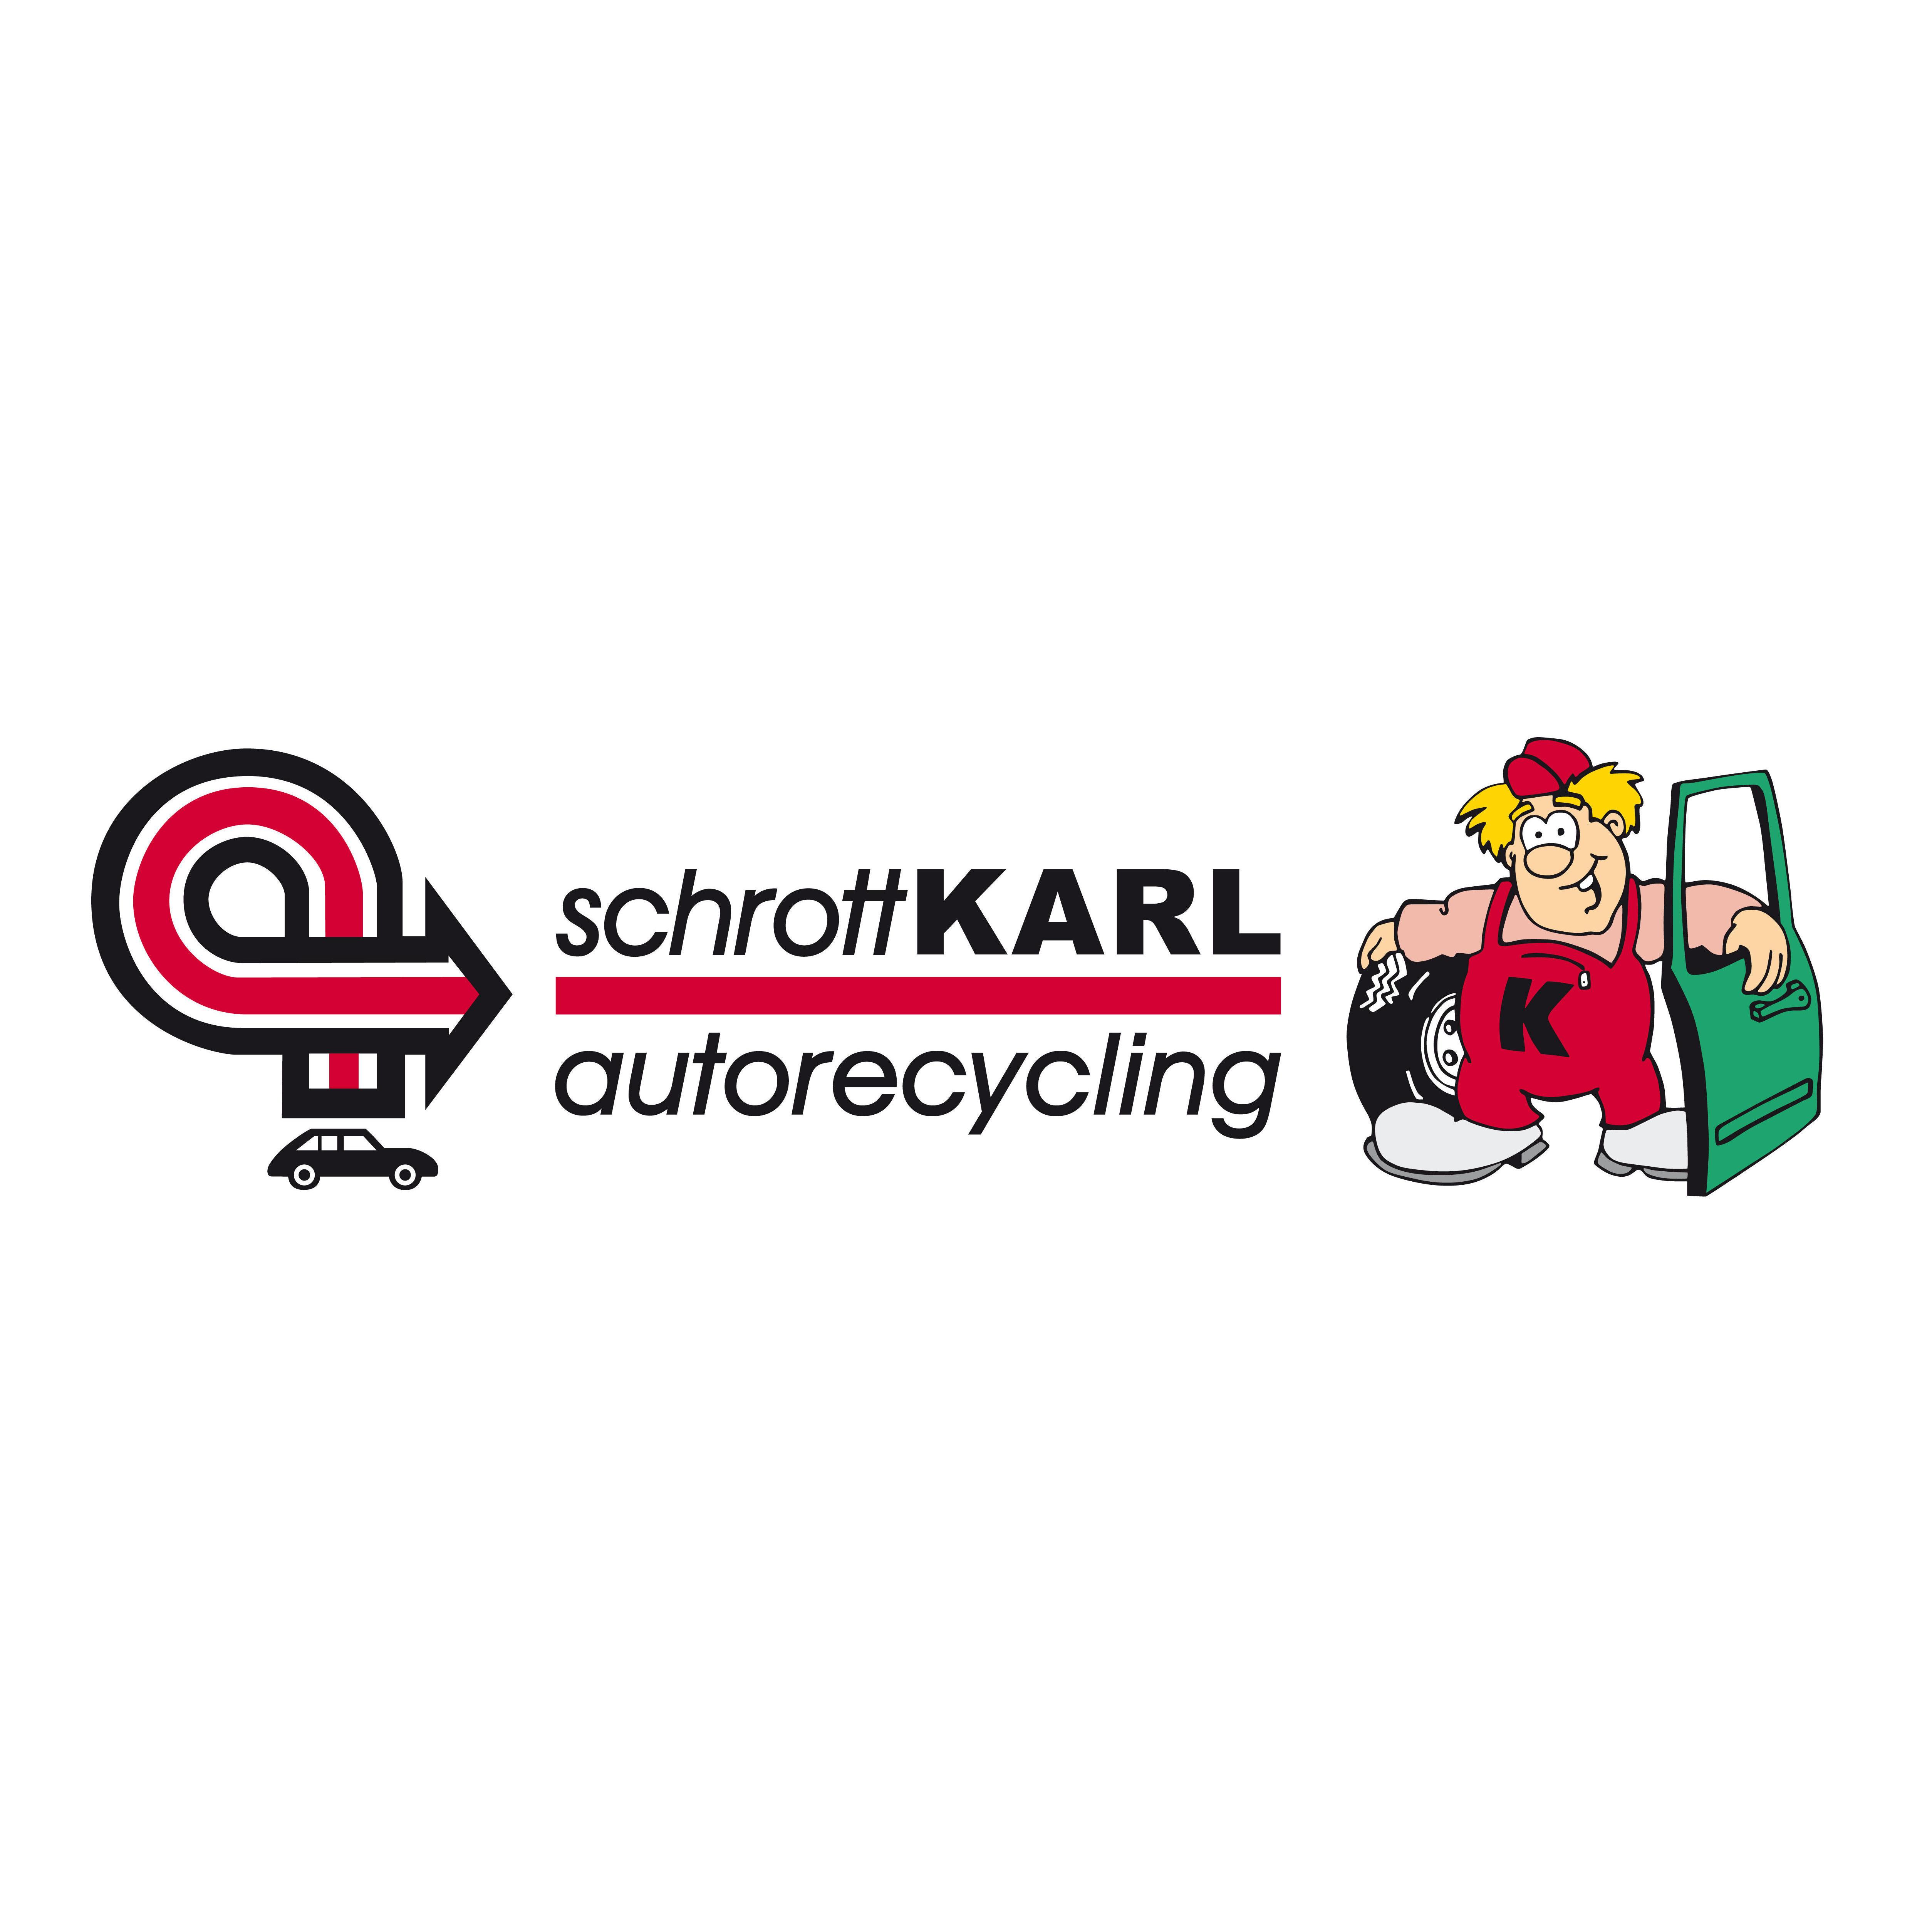 Autorecycling GmbH&Co.KG Schrott Karl